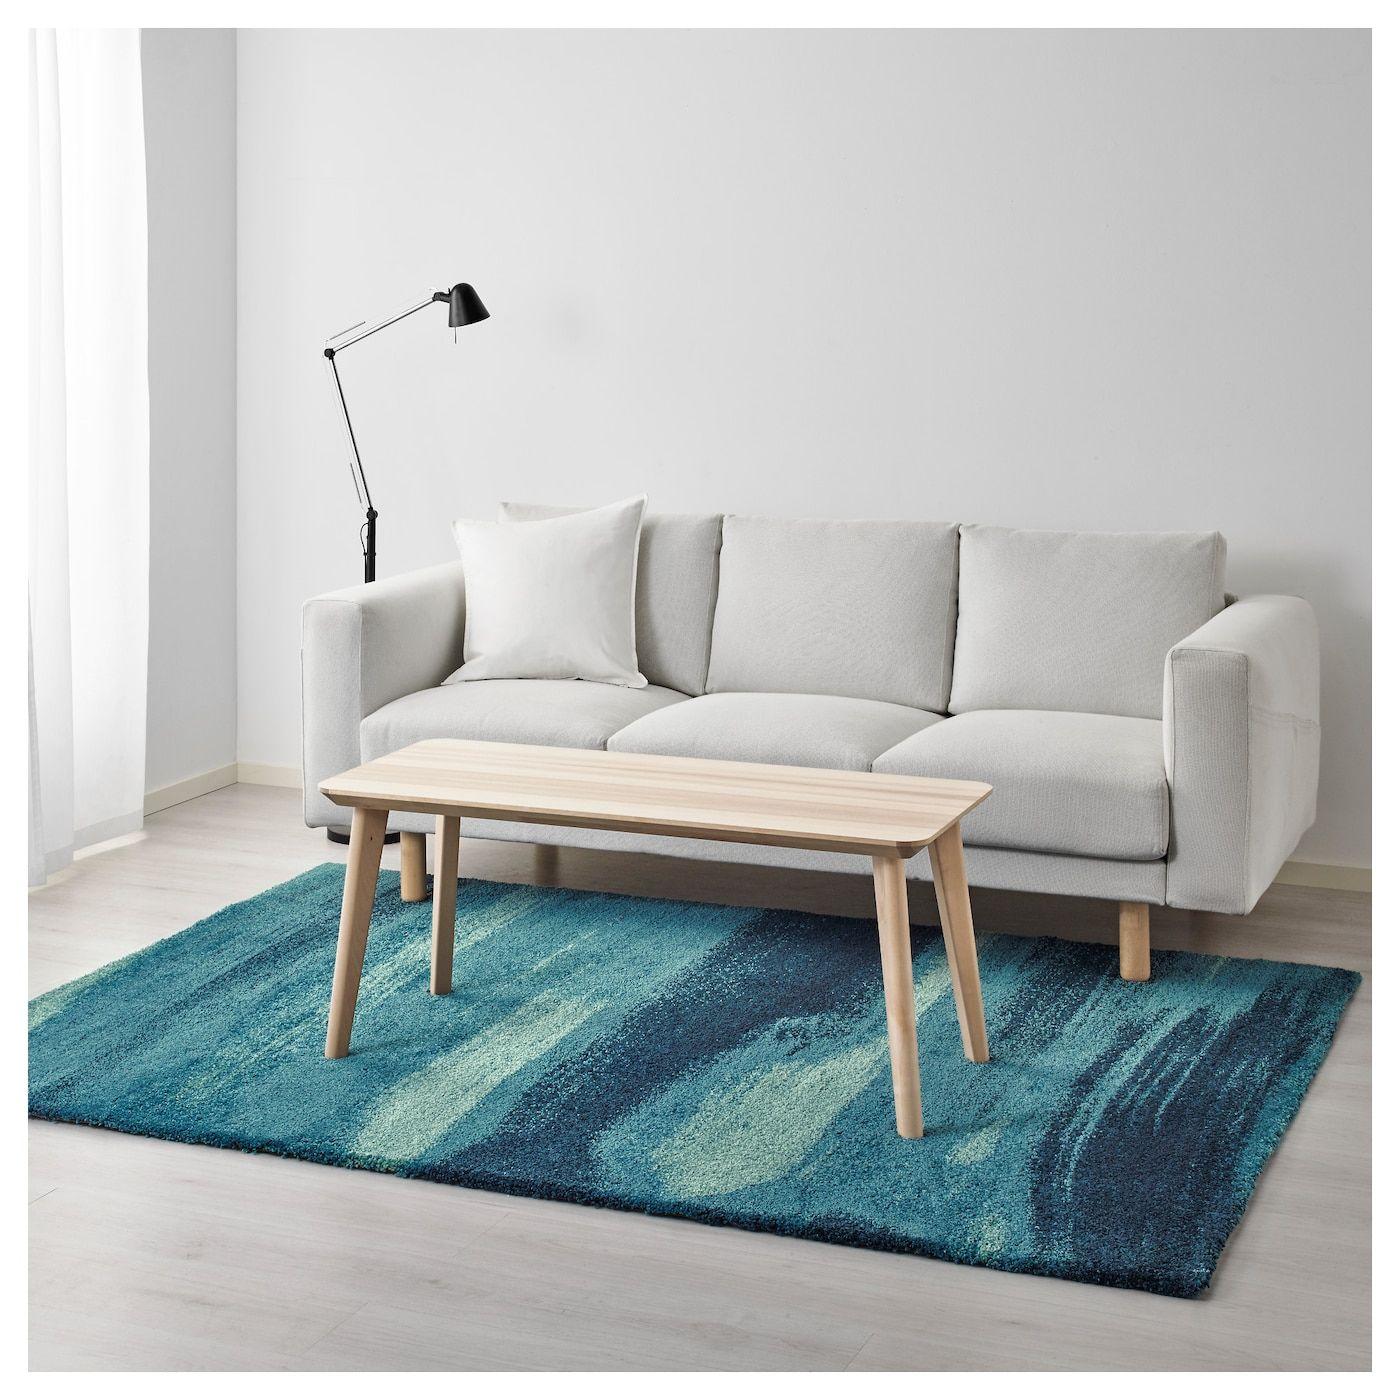 IKEA SONDEROD Blue Rug, high pile Living room carpet